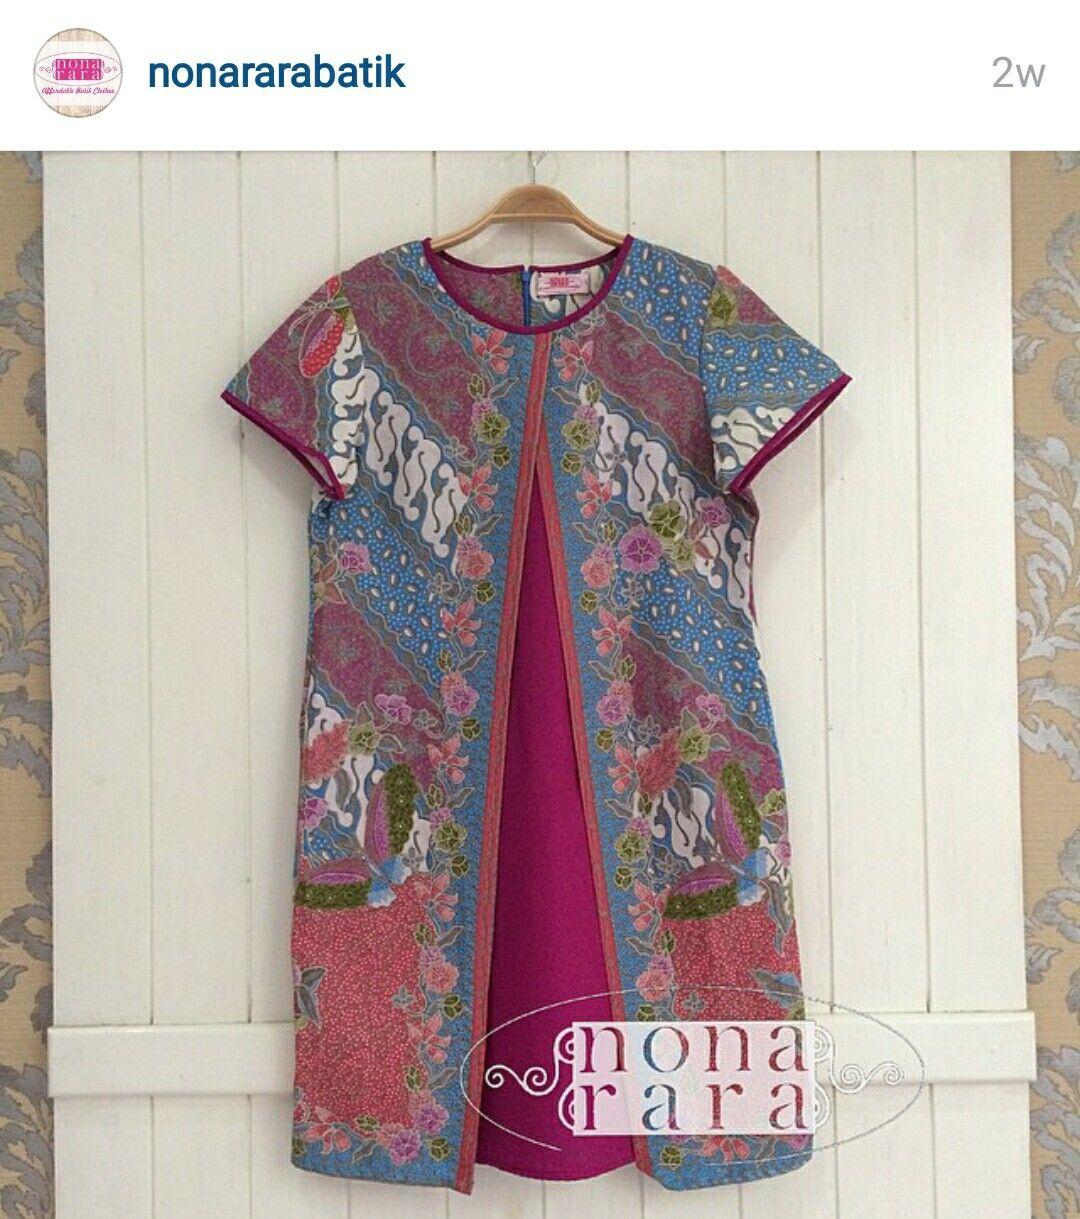 Batik Tulis Dress: Dress, Top, Blouse Batik Indonesia